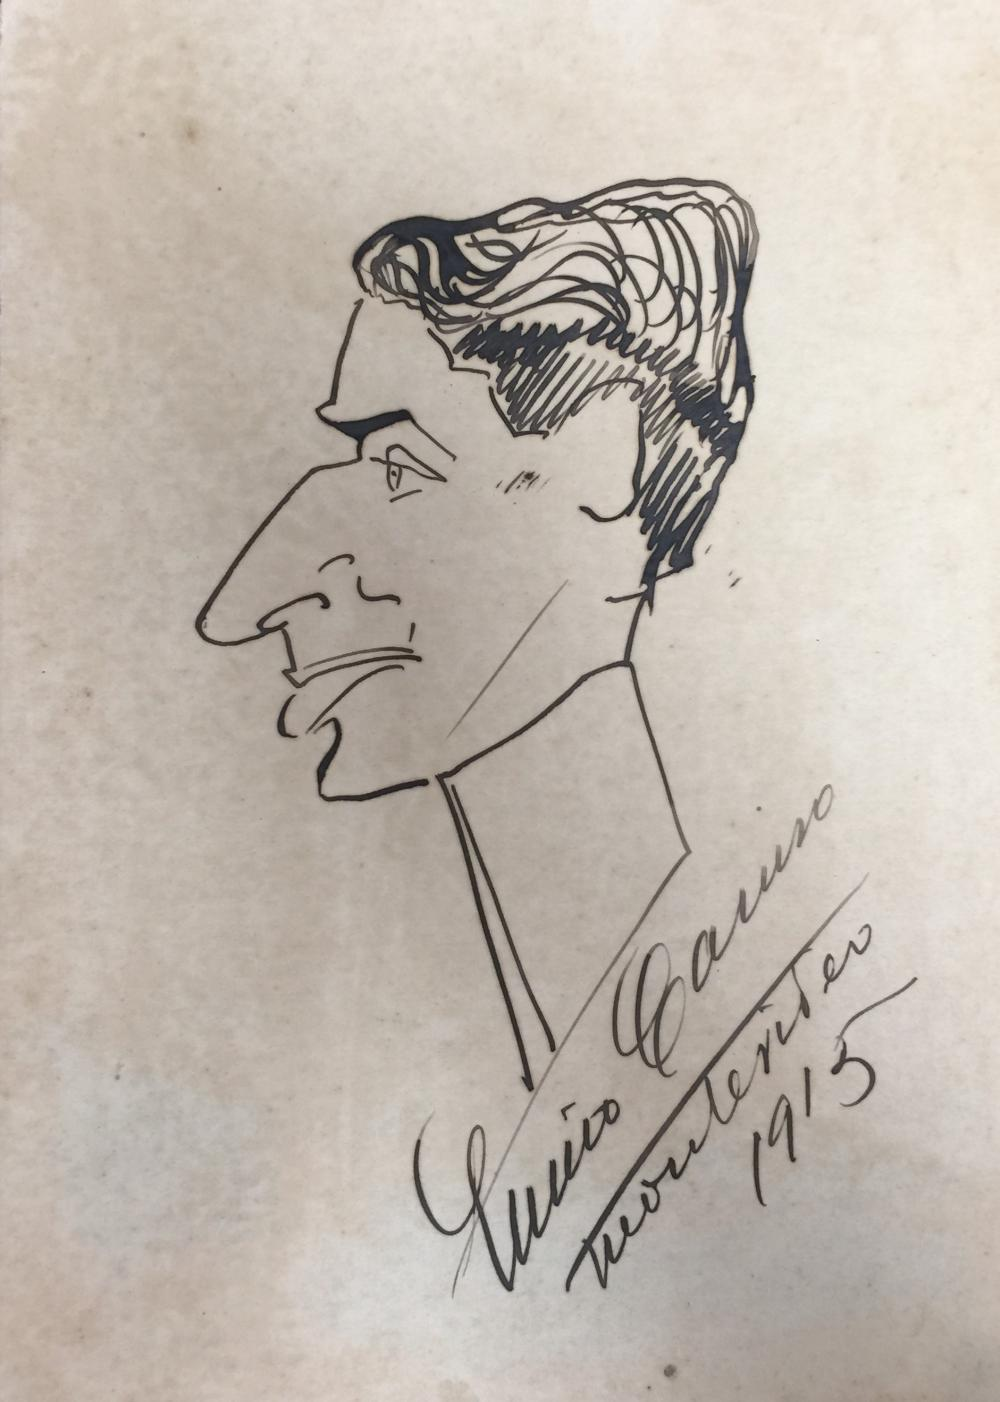 Enrico Carusso